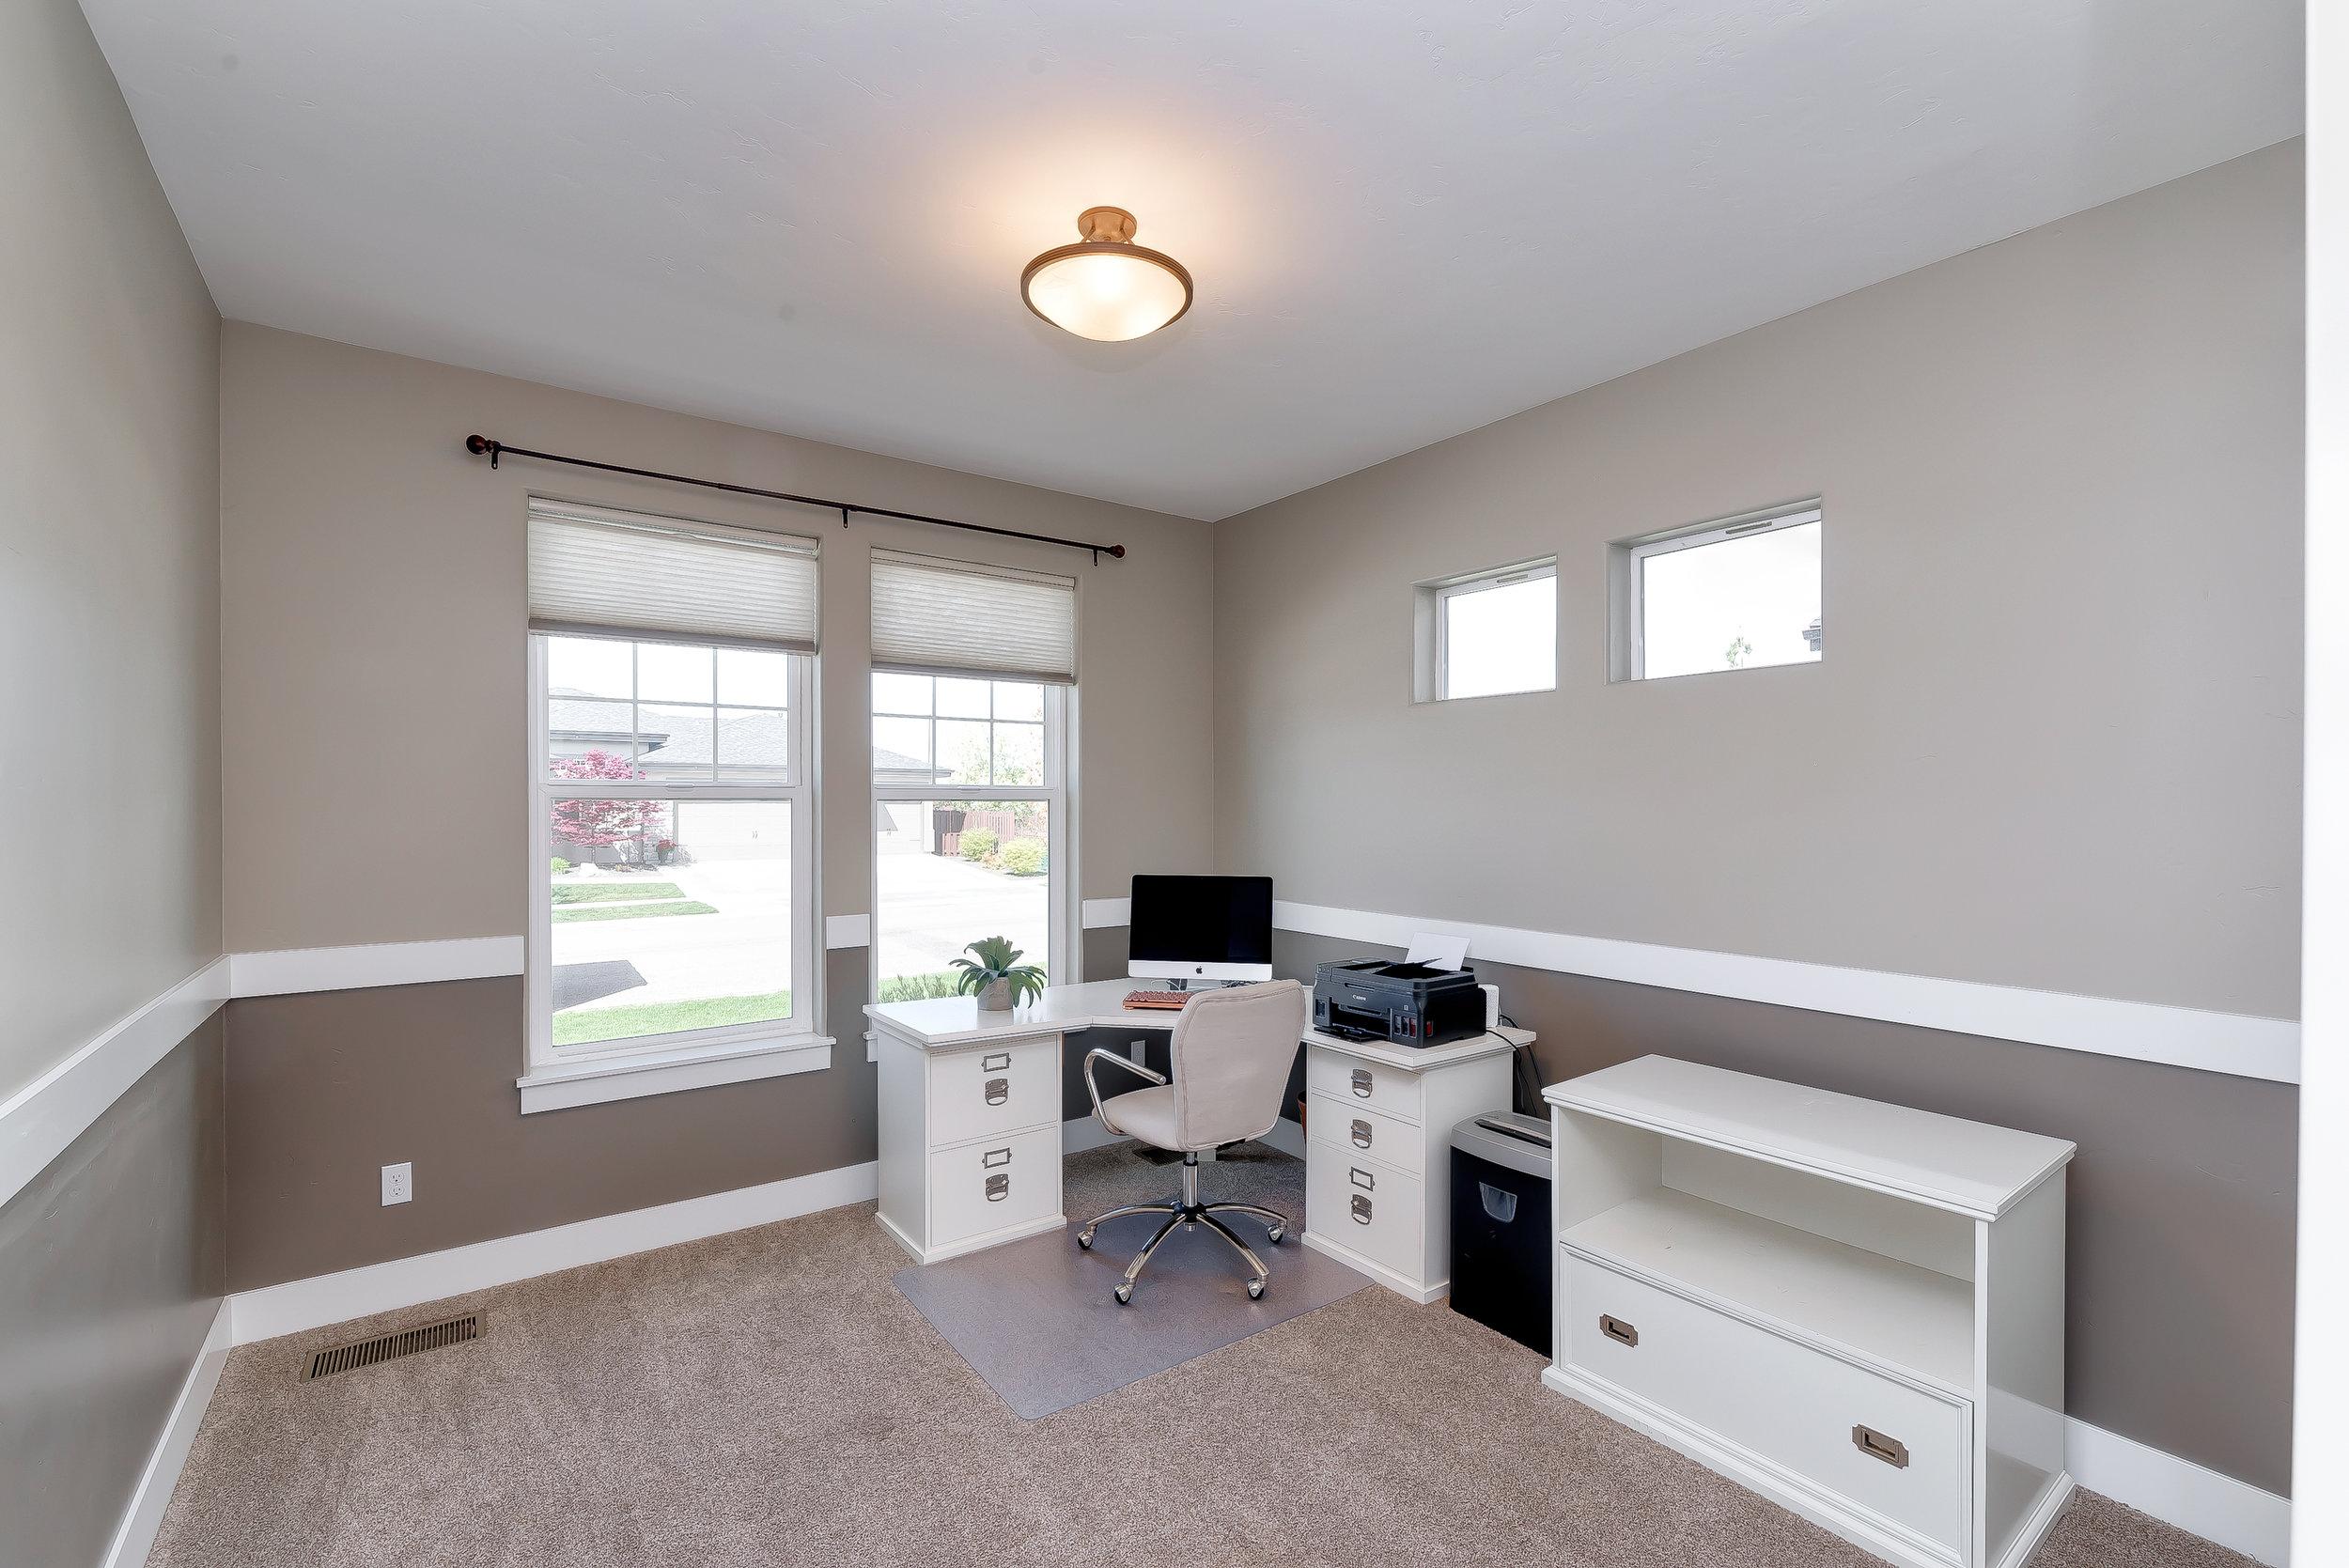 06-Office_Bedroom.jpg